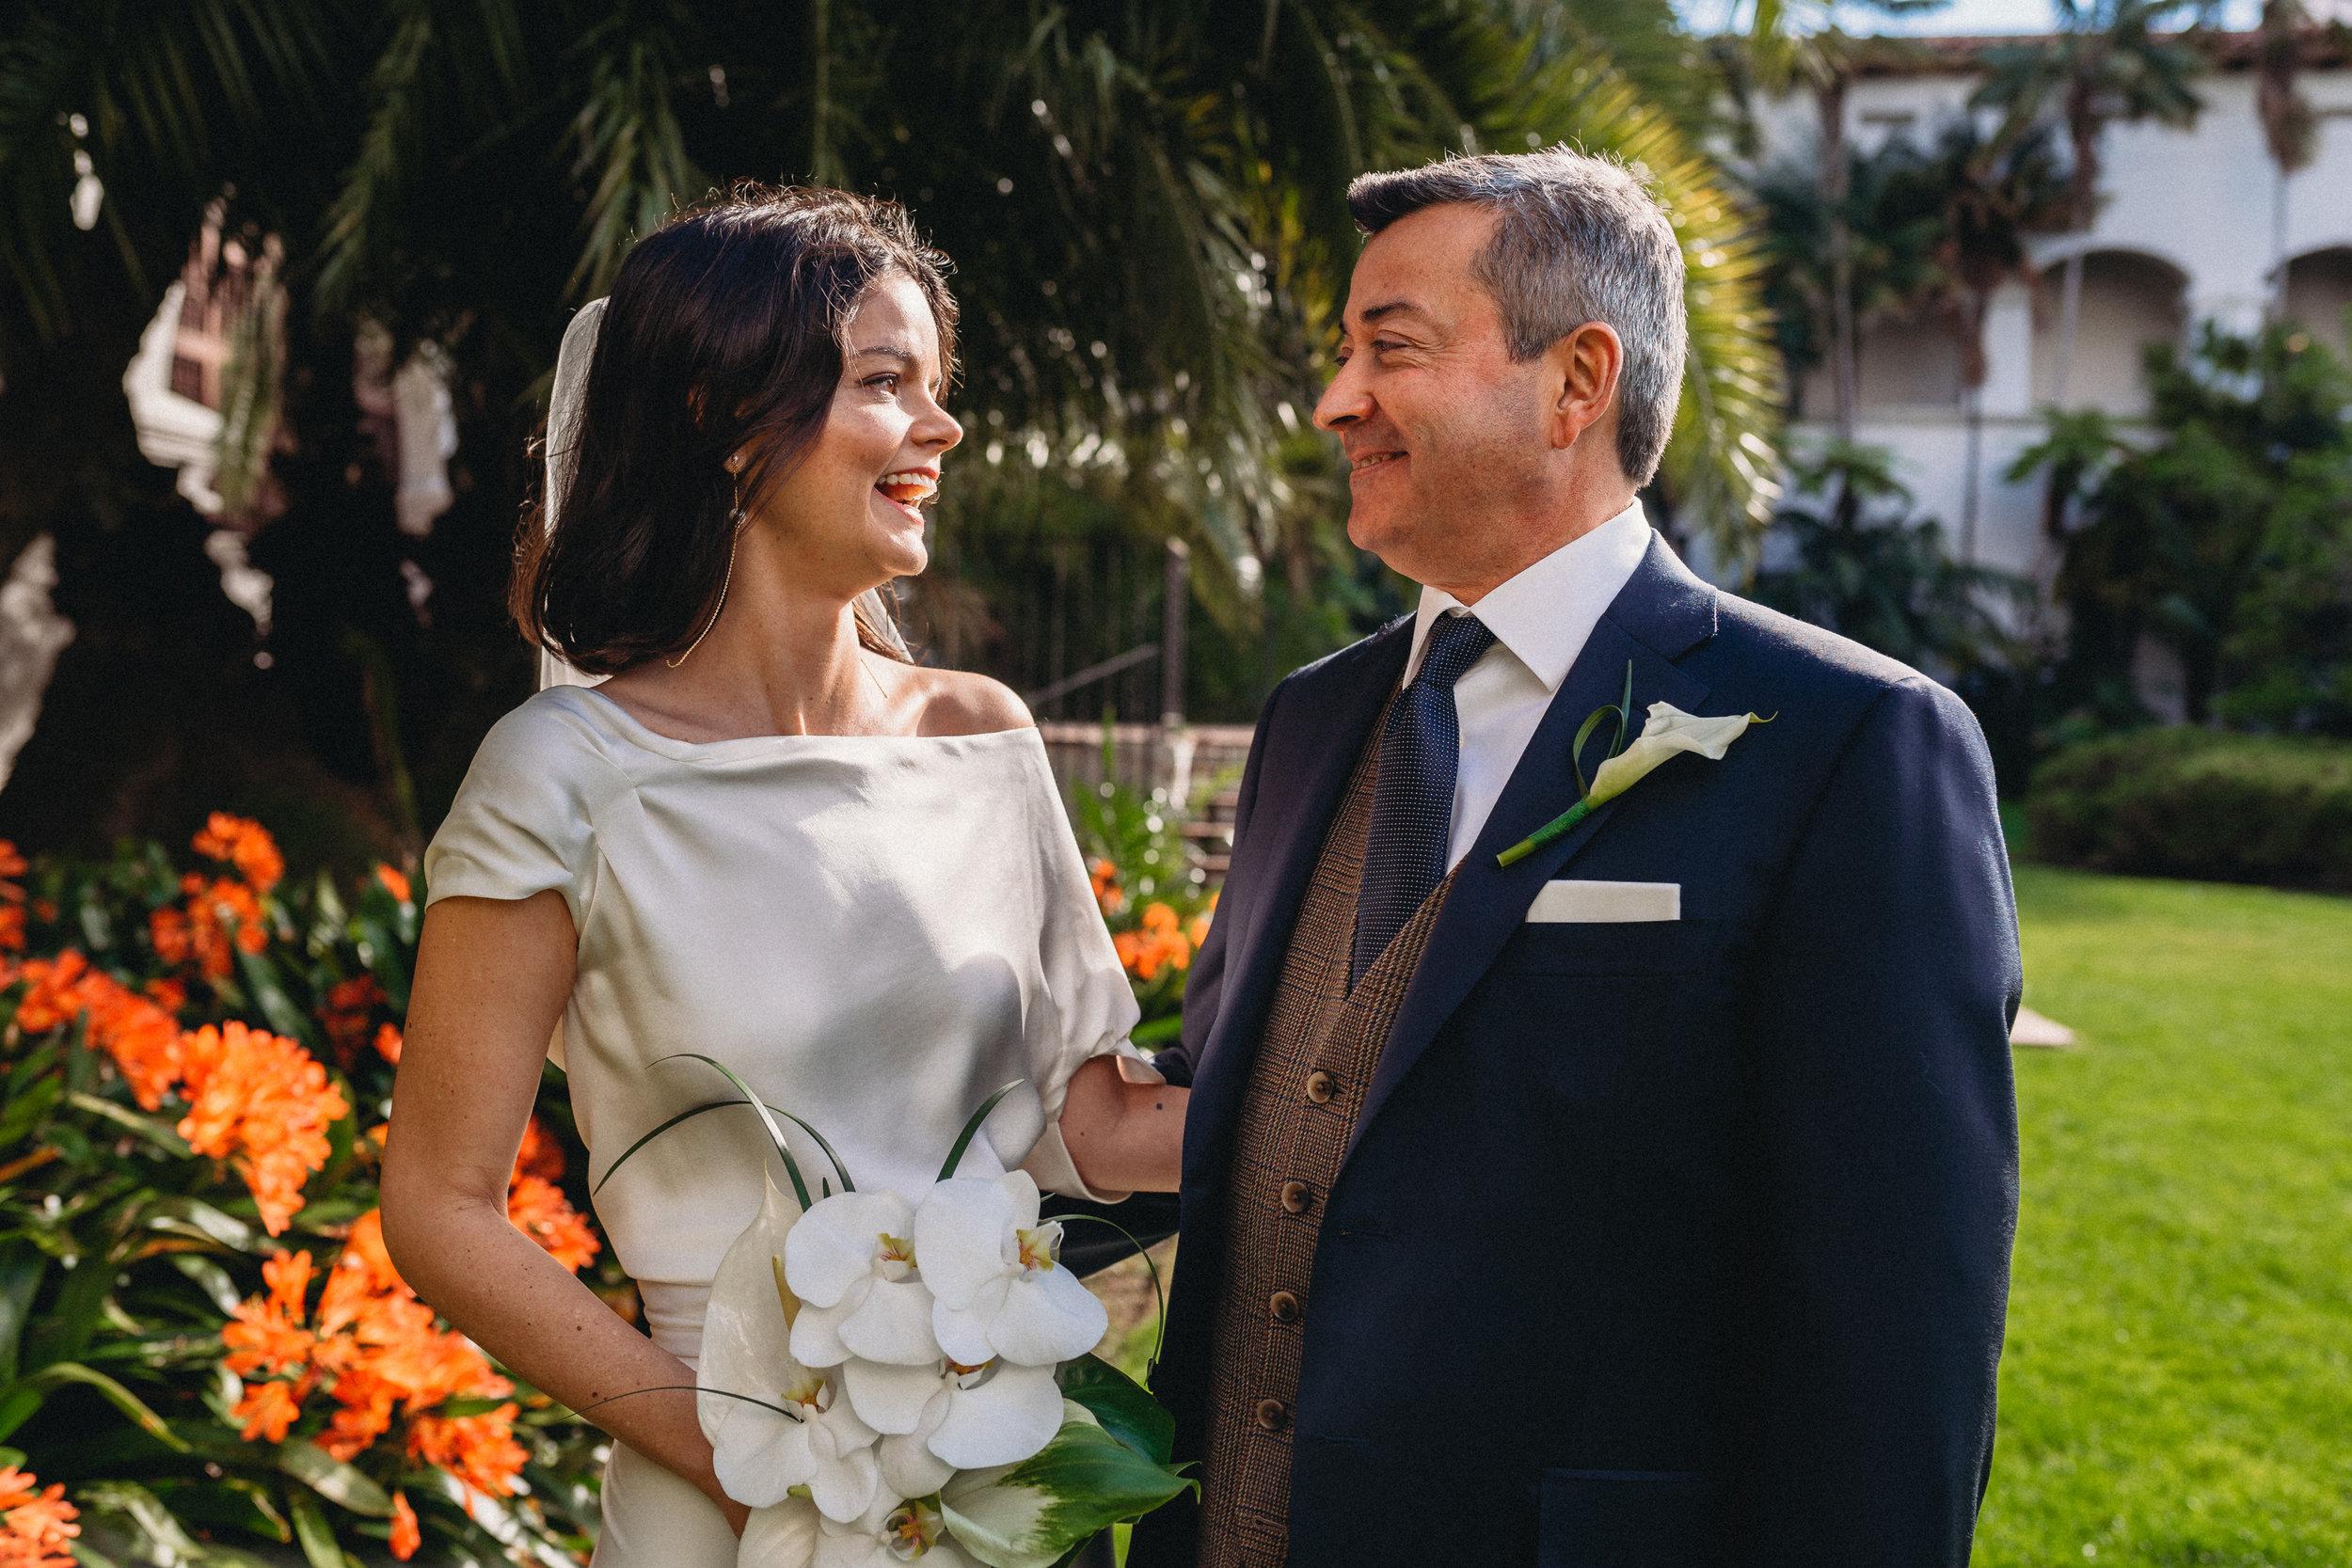 wedding-photography-santa-barbara-courthouse-rebeccaylasotras-119.jpg